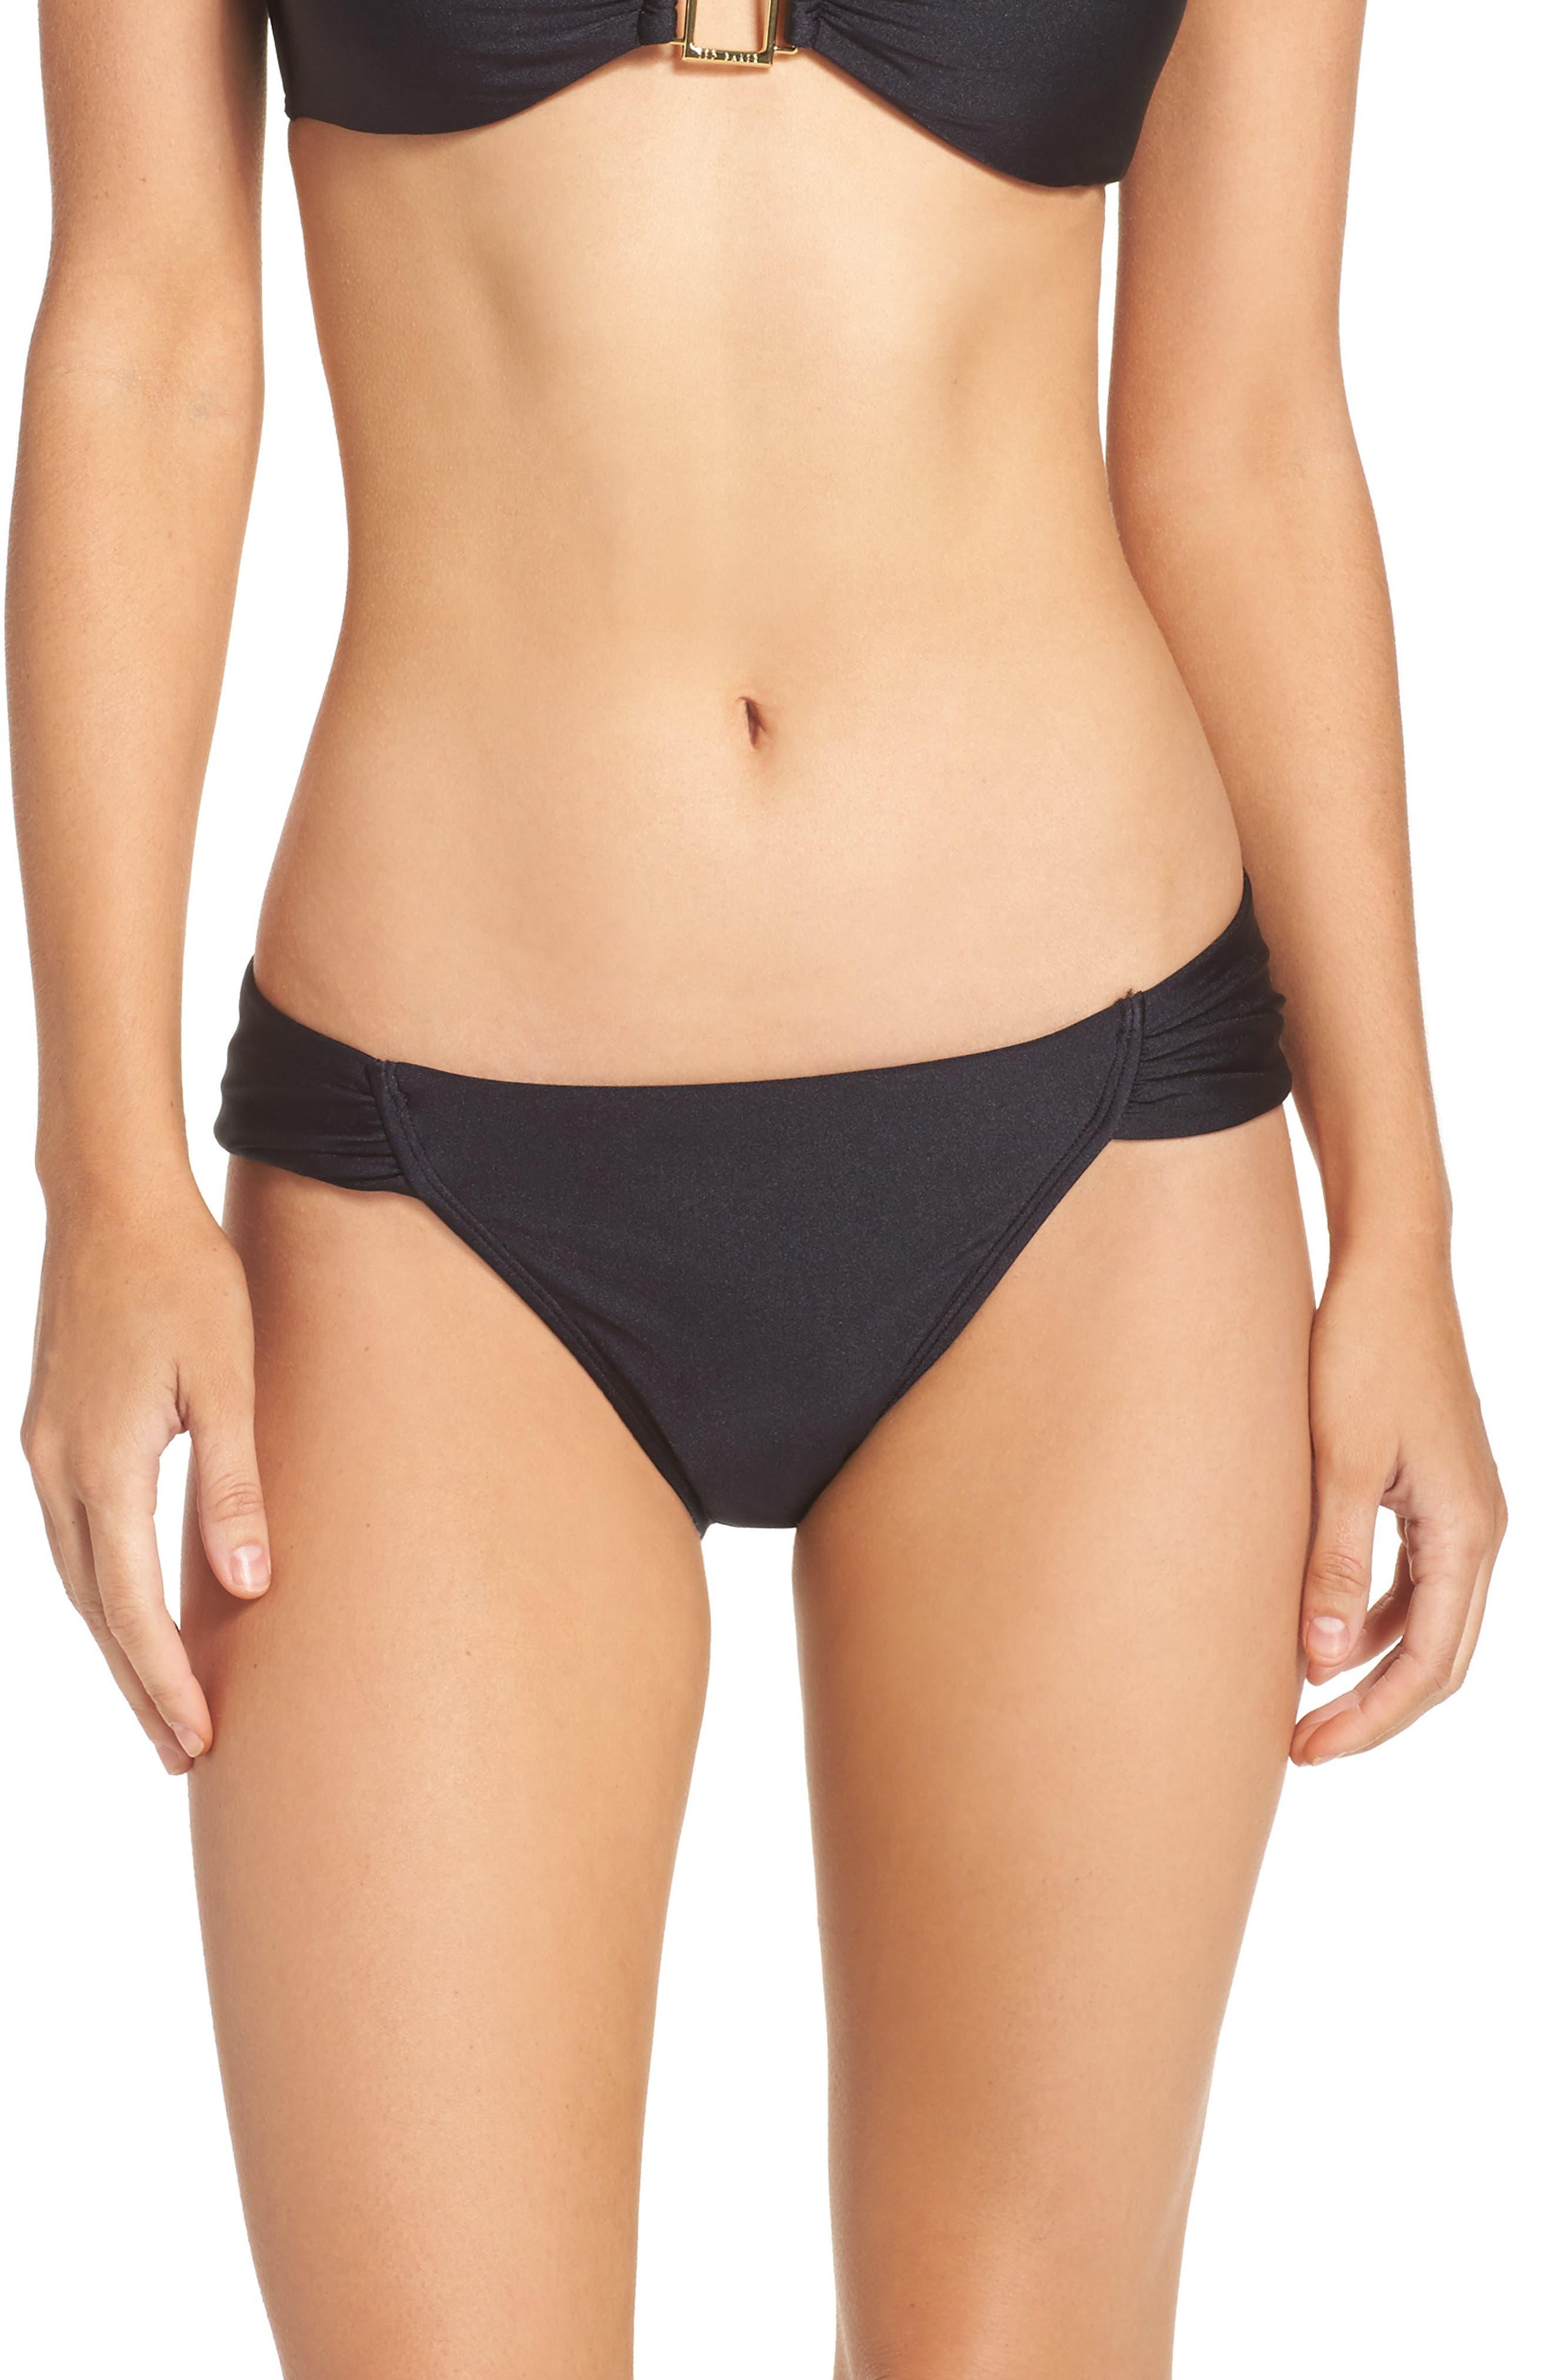 Annay Classic Bikini Bottoms,                         Main,                         color, 001